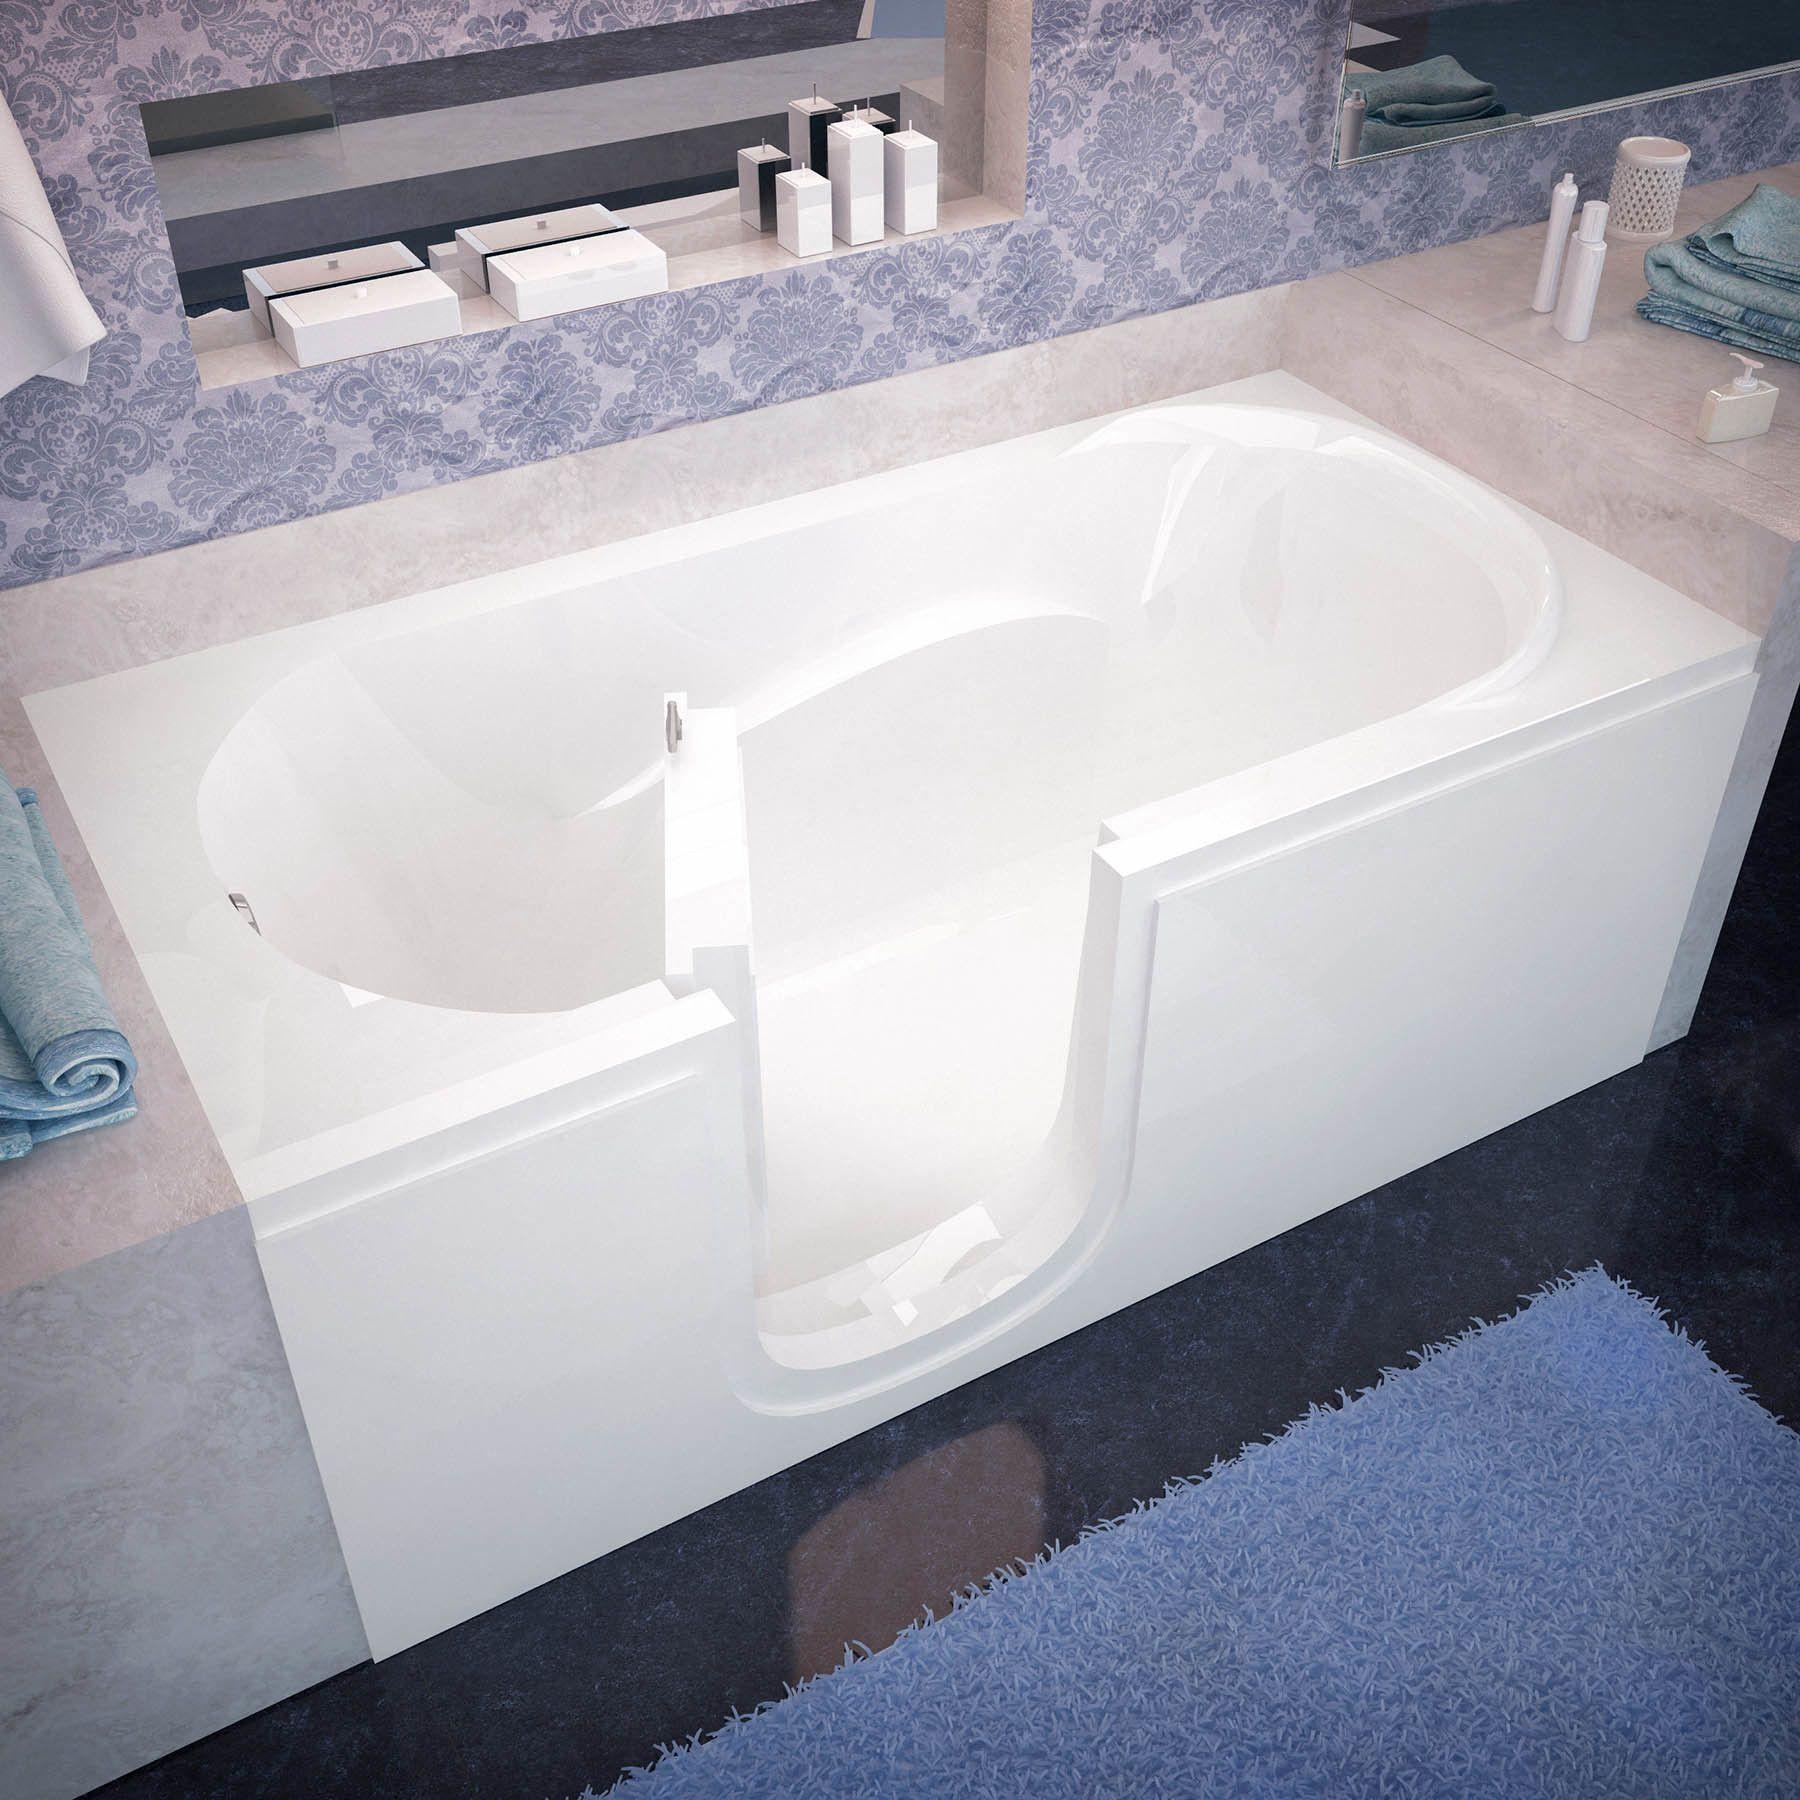 Ashton 60 X 30 Whirlpool Soaking Bathtub With Images Bathtub